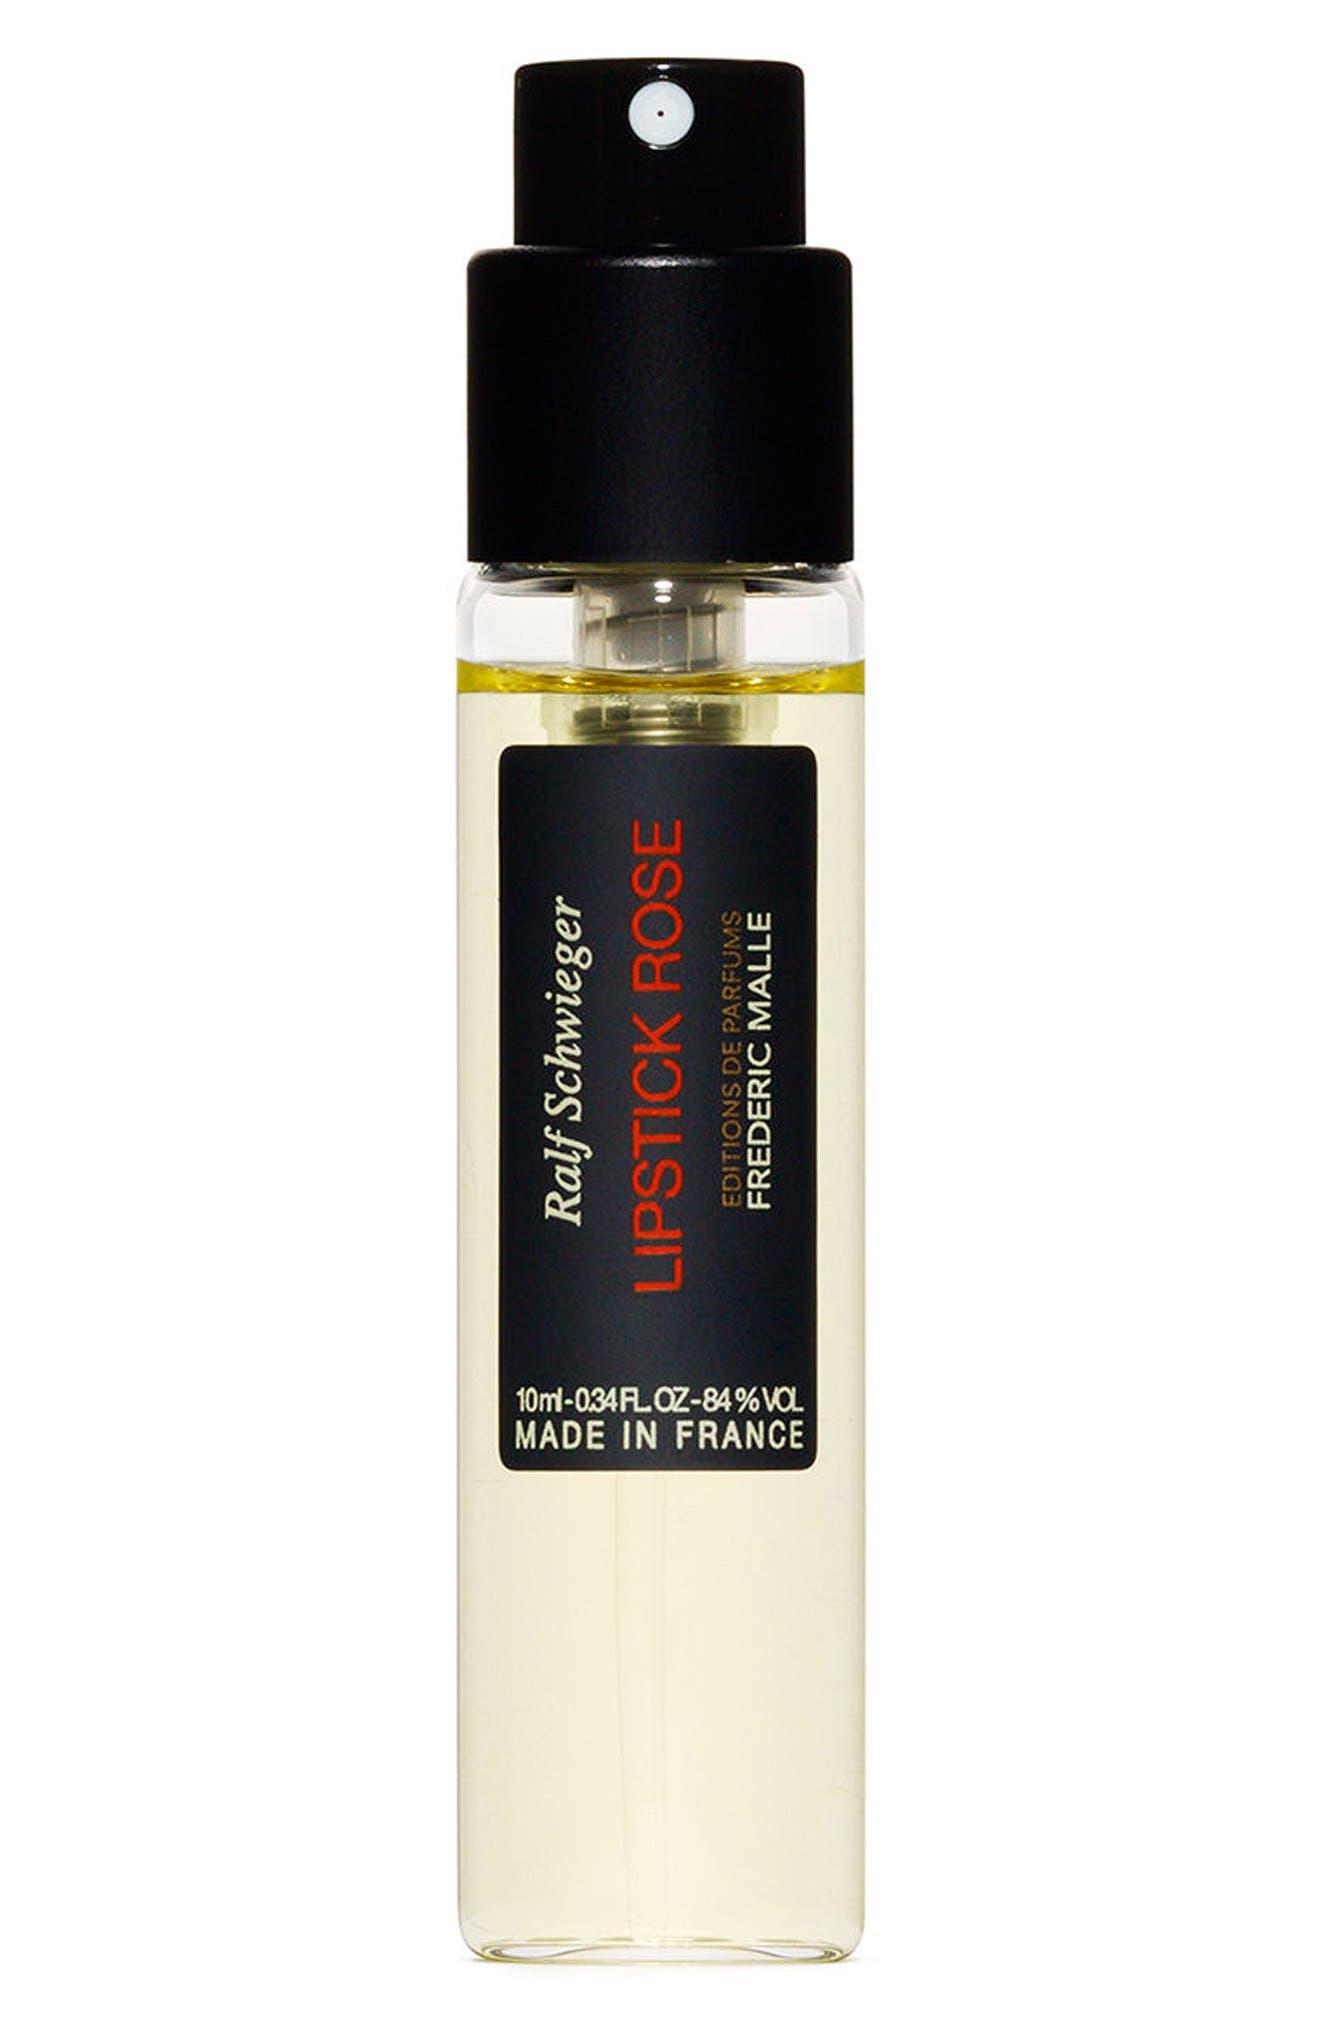 Main Image - Editions de Parfums Frédéric Malle Lipstick Rose Travel Fragrance Spray